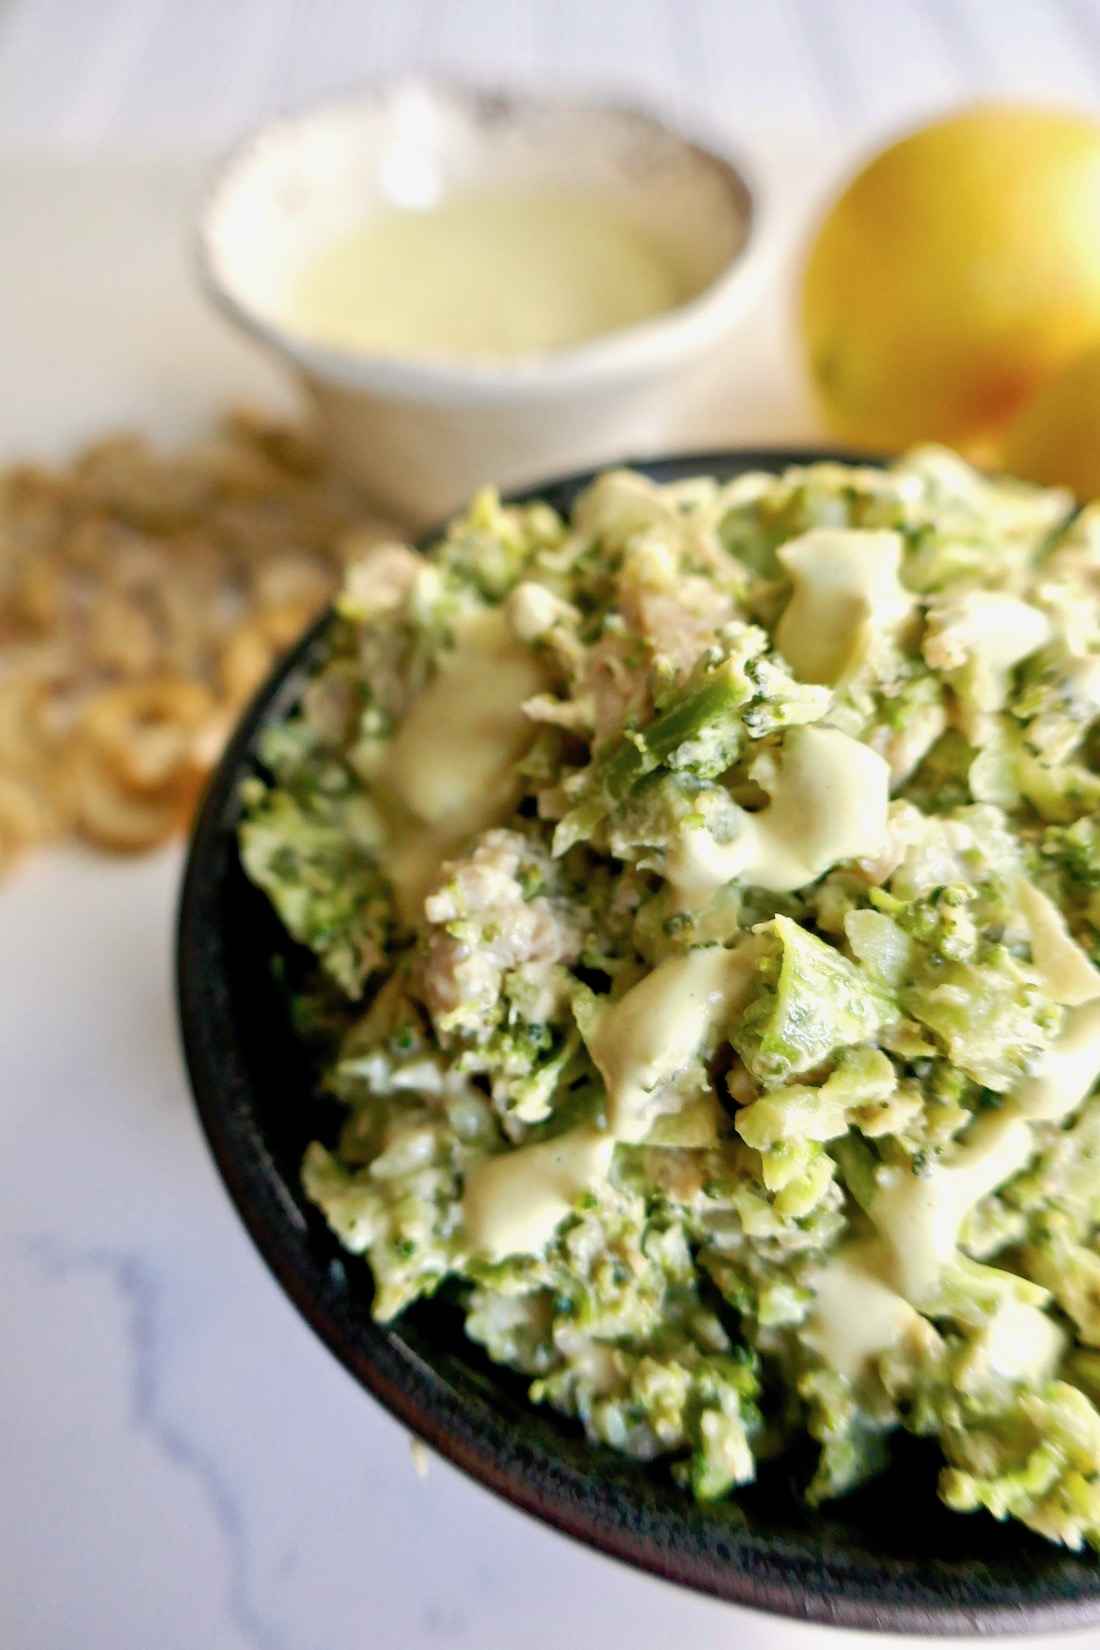 Curry broccoli chicken salad